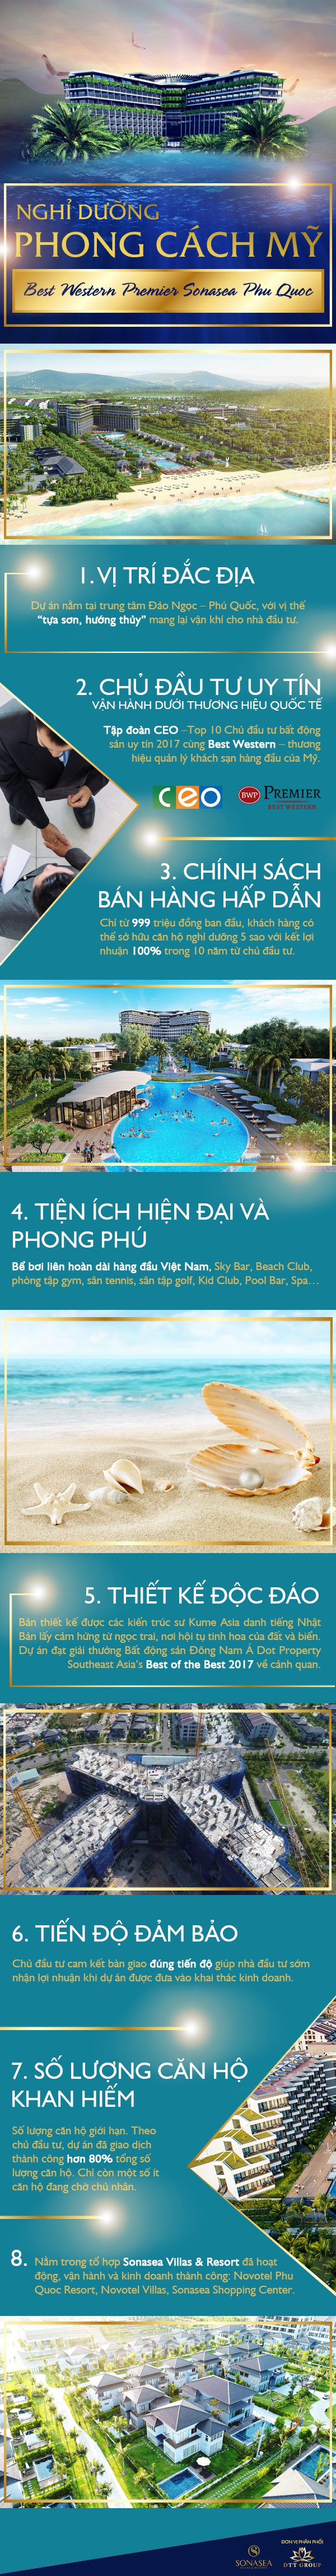 Best Western Premier Sonasea Phu Quoc: Nghỉ dưỡng phong cách Mỹ - 1